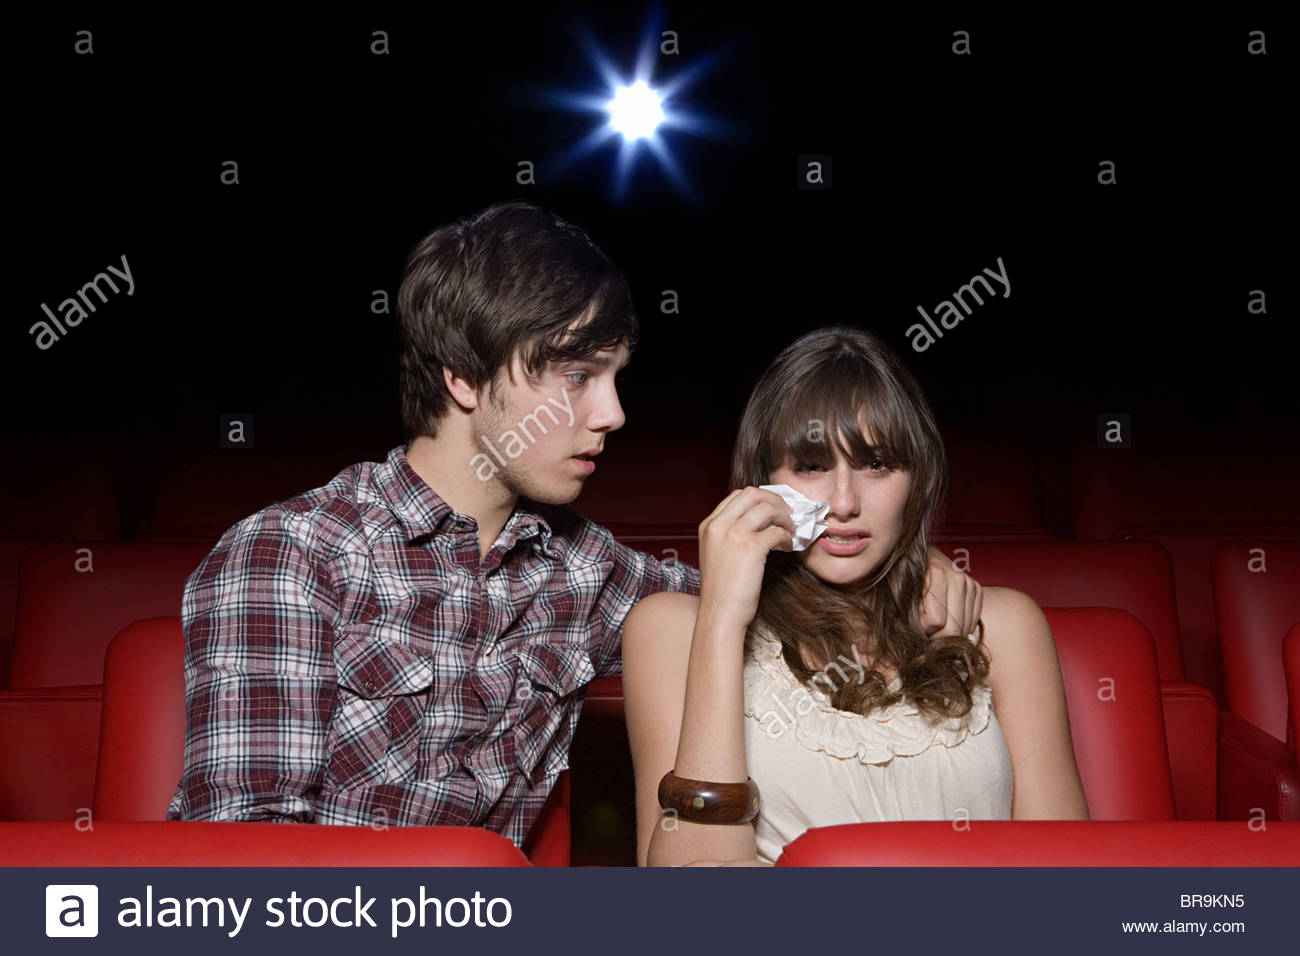 Junges Paar im Kino, beide Weinen Stockbild